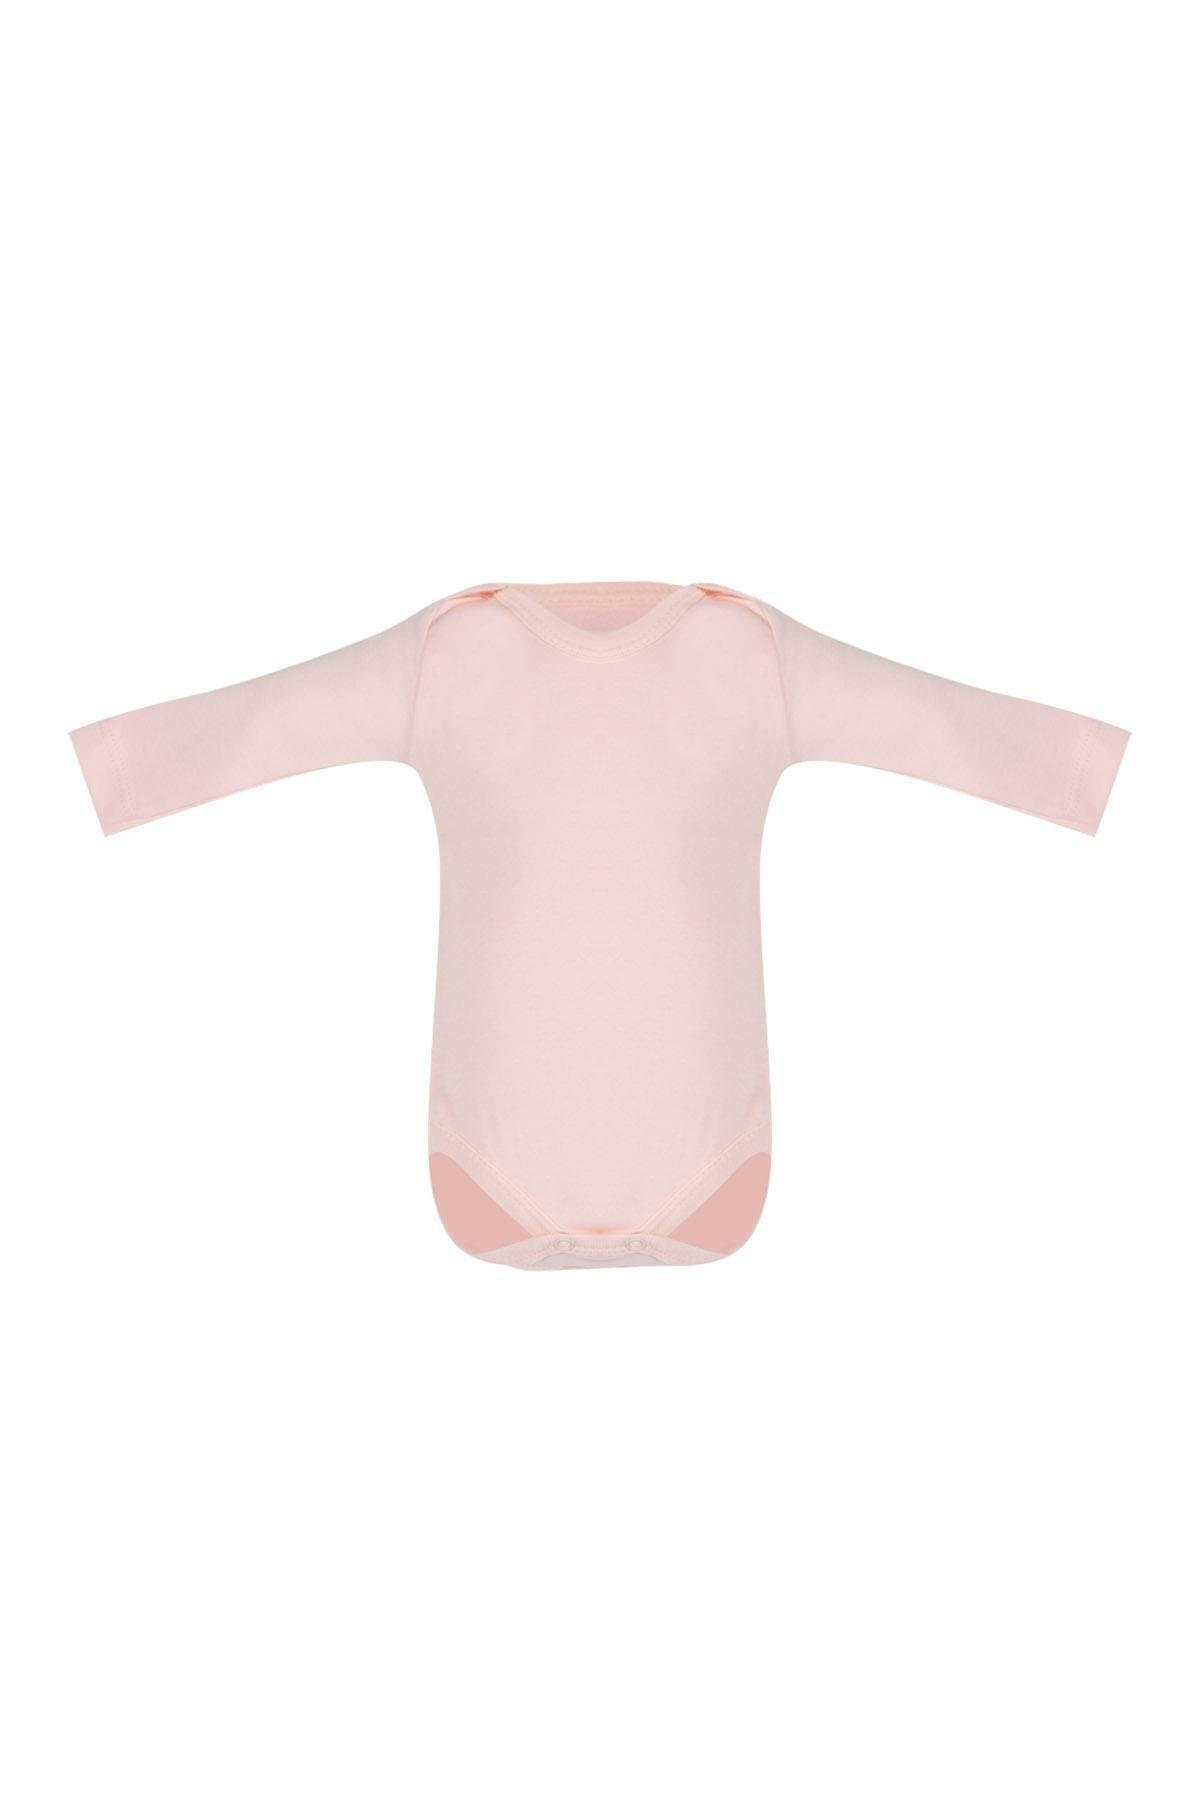 Pattaya Kids Kız Bebek Uzun Kollu Badi 2'li Takım 0-36 Ay BBTOO-BDY113 1